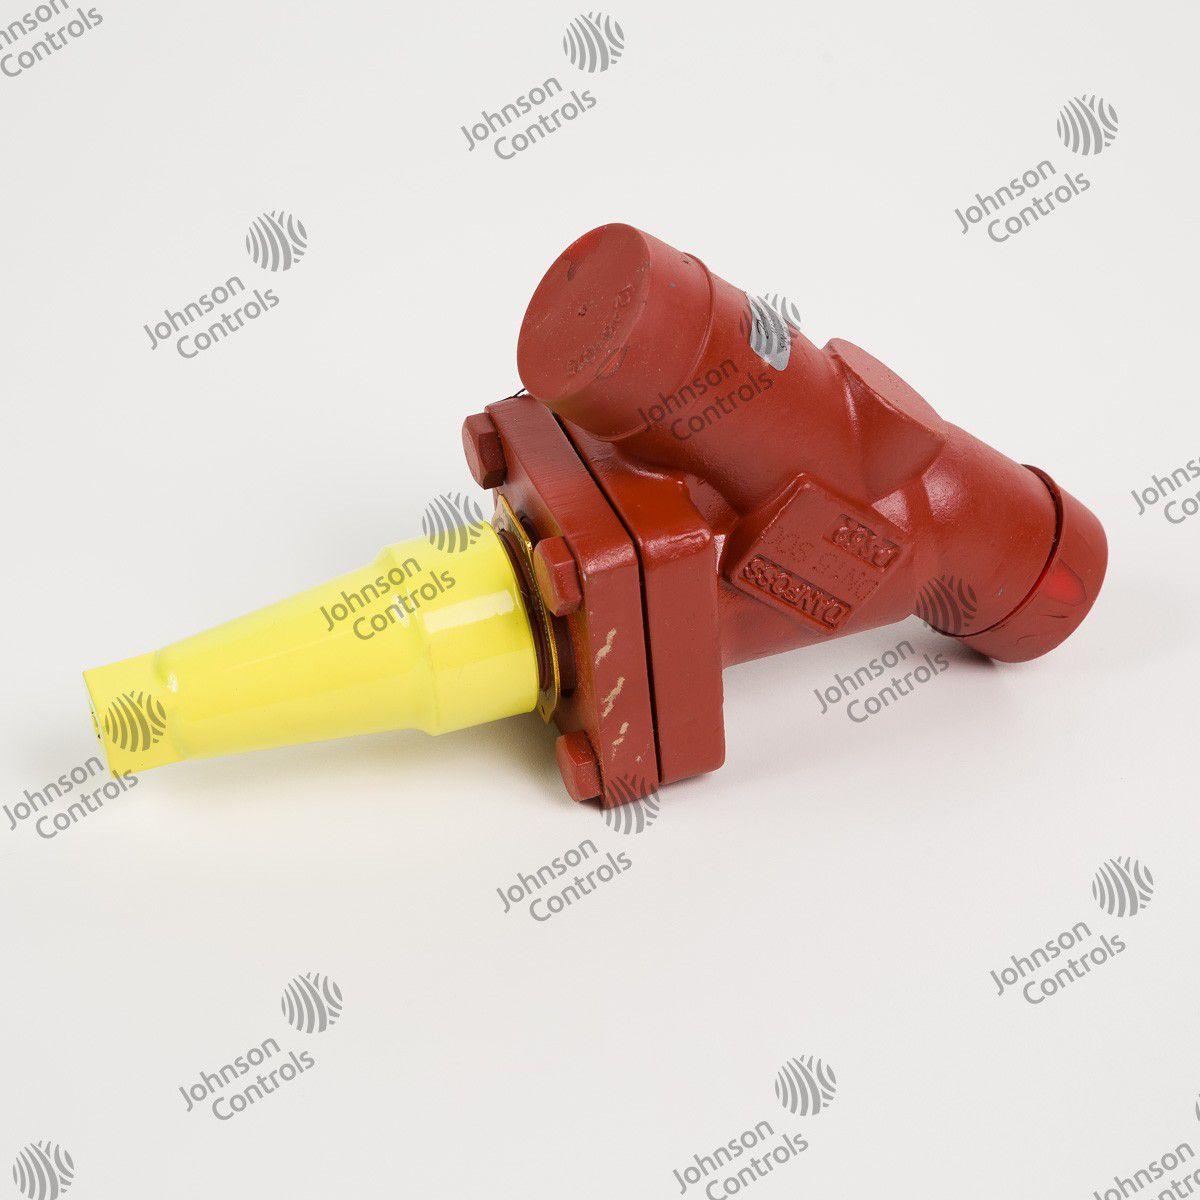 VALV REG 15 CNX SOC RET CONE A - 1379+852-01